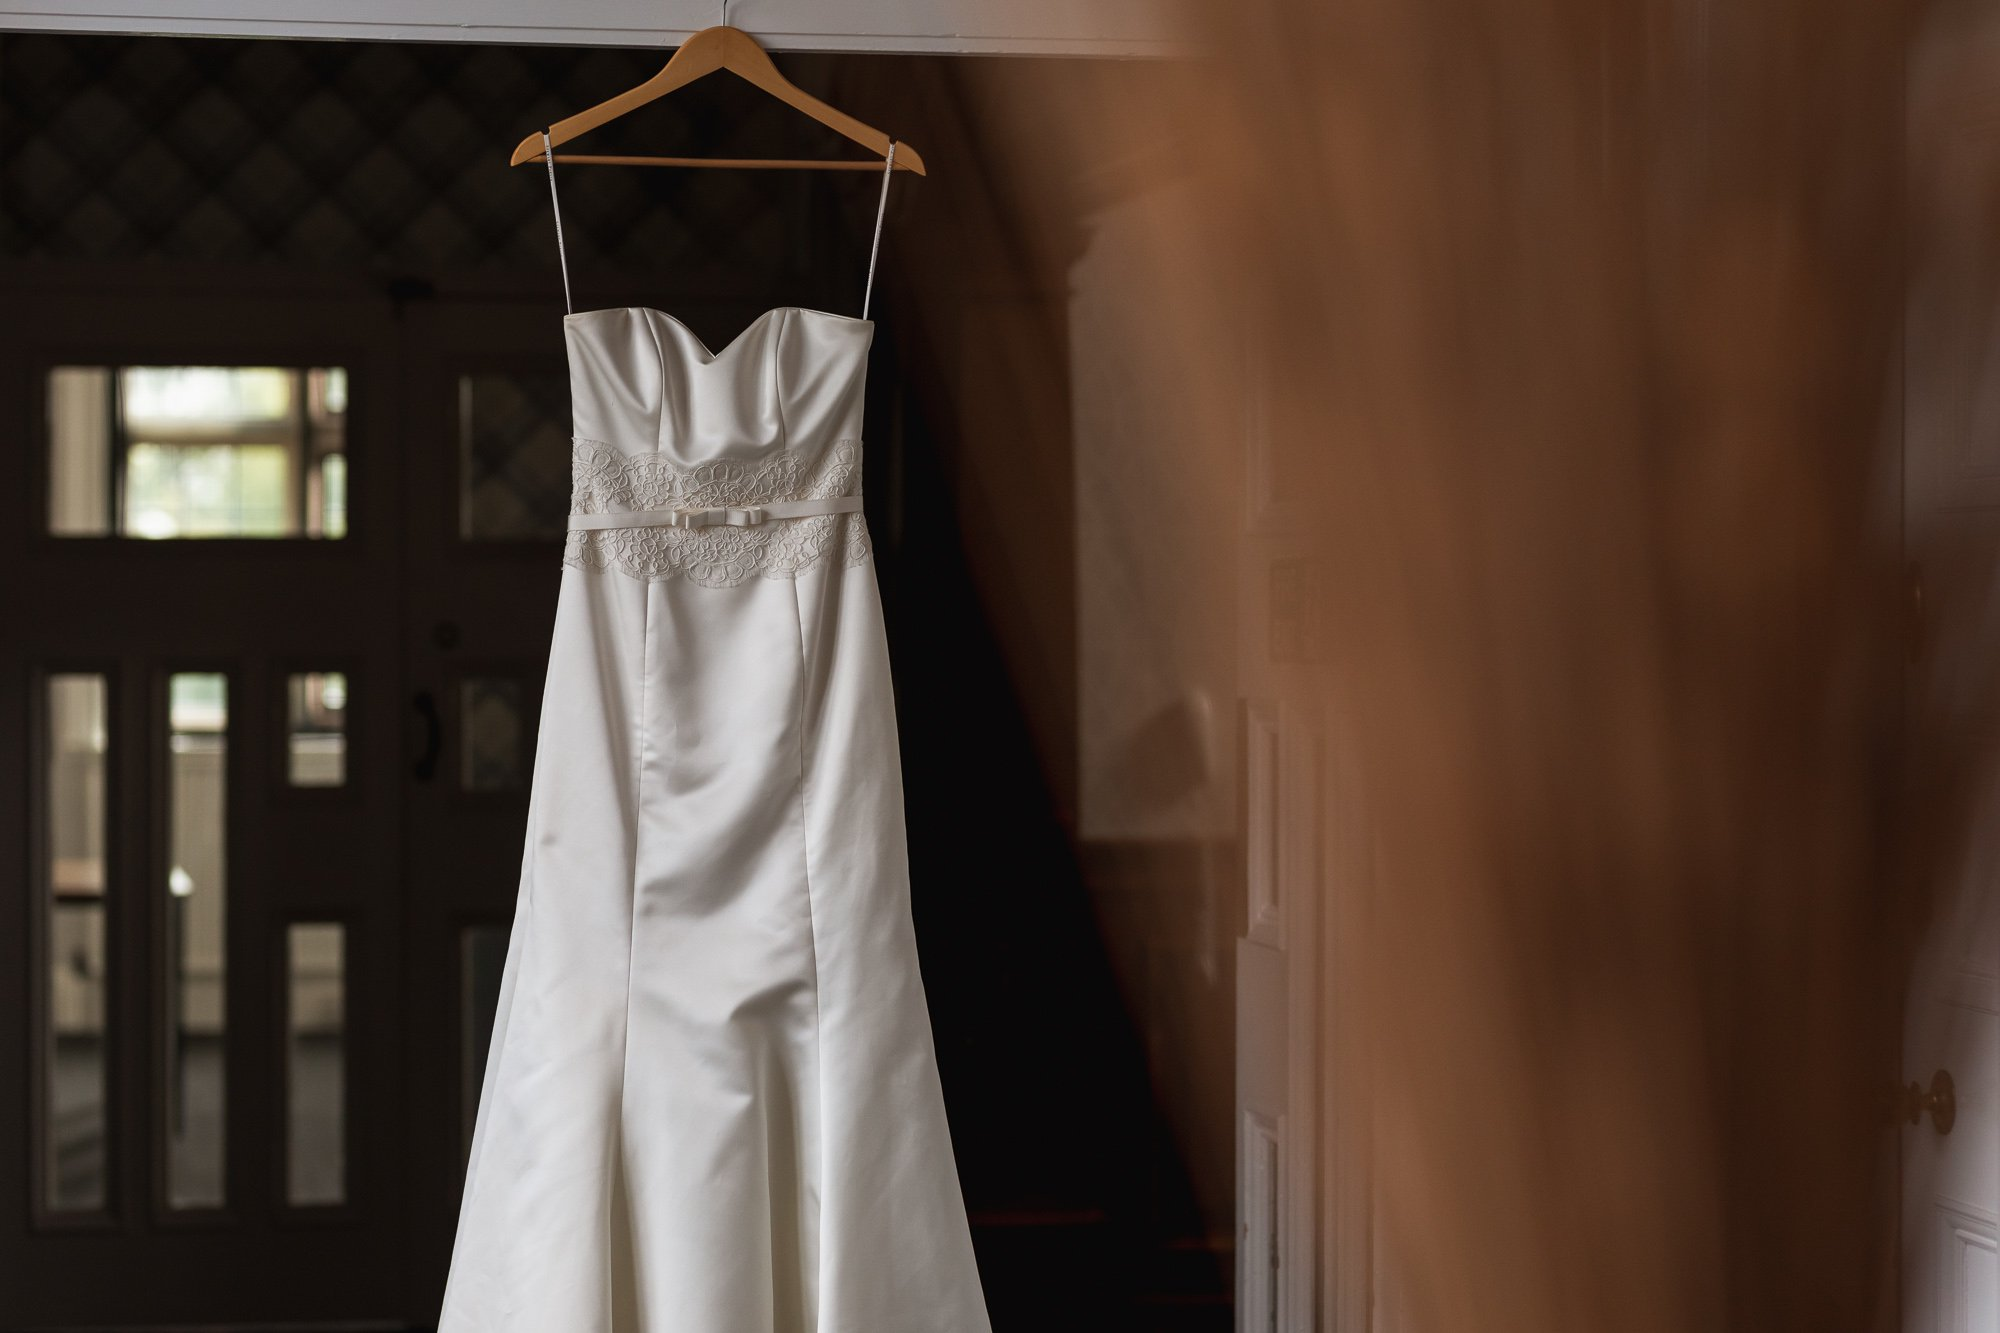 Dunchurch Park Hotel, Asian wedding photographer Midlands, wedding dress